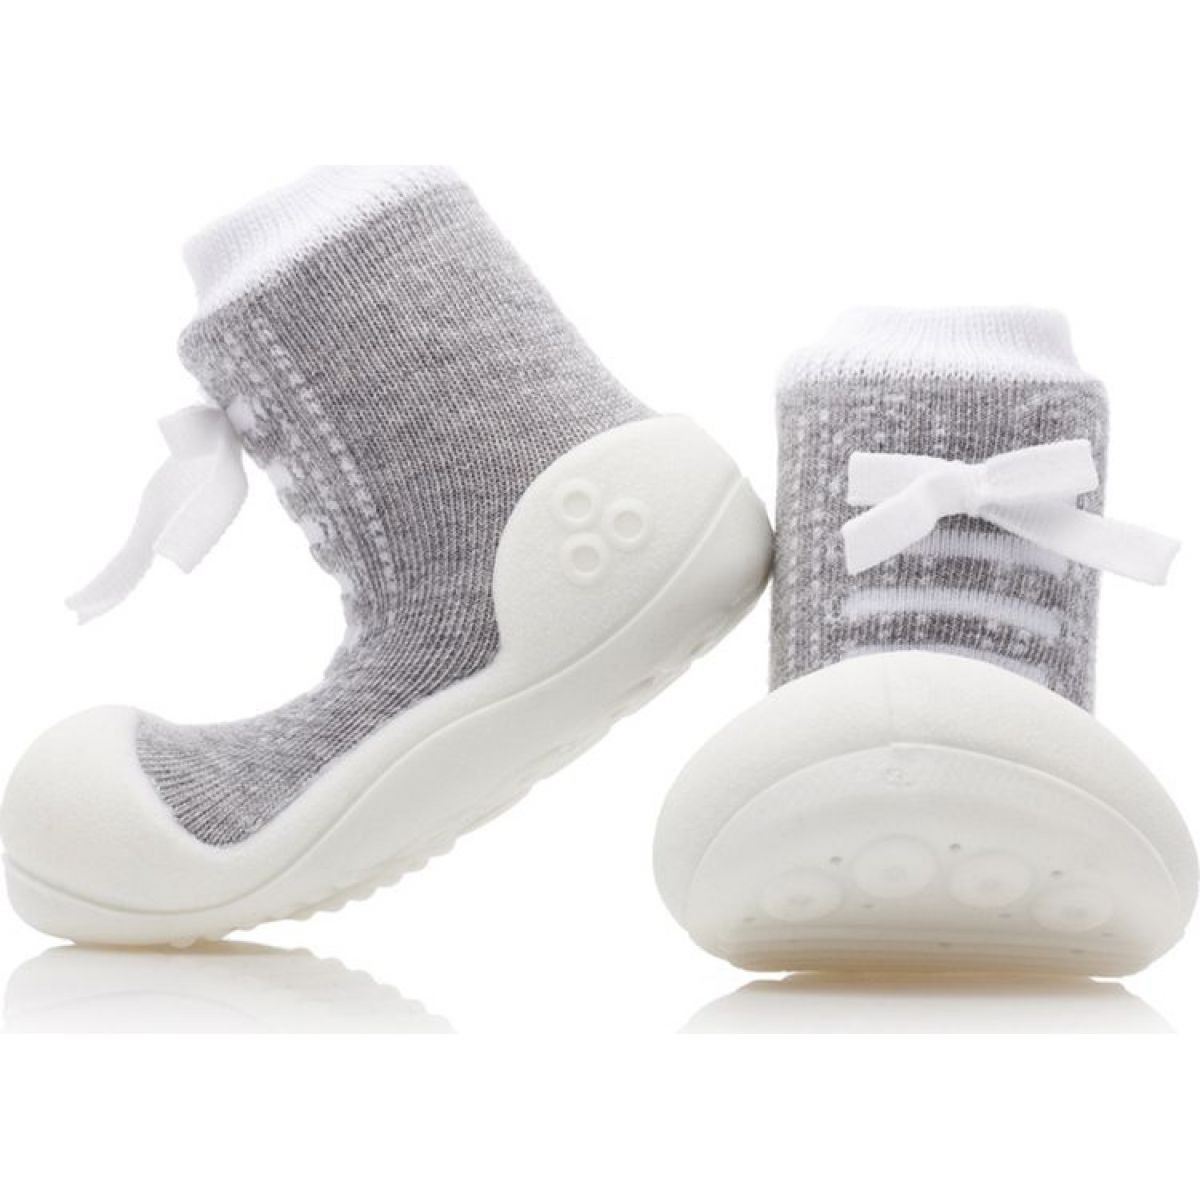 Attipas Sneakers Gray - Euro 19